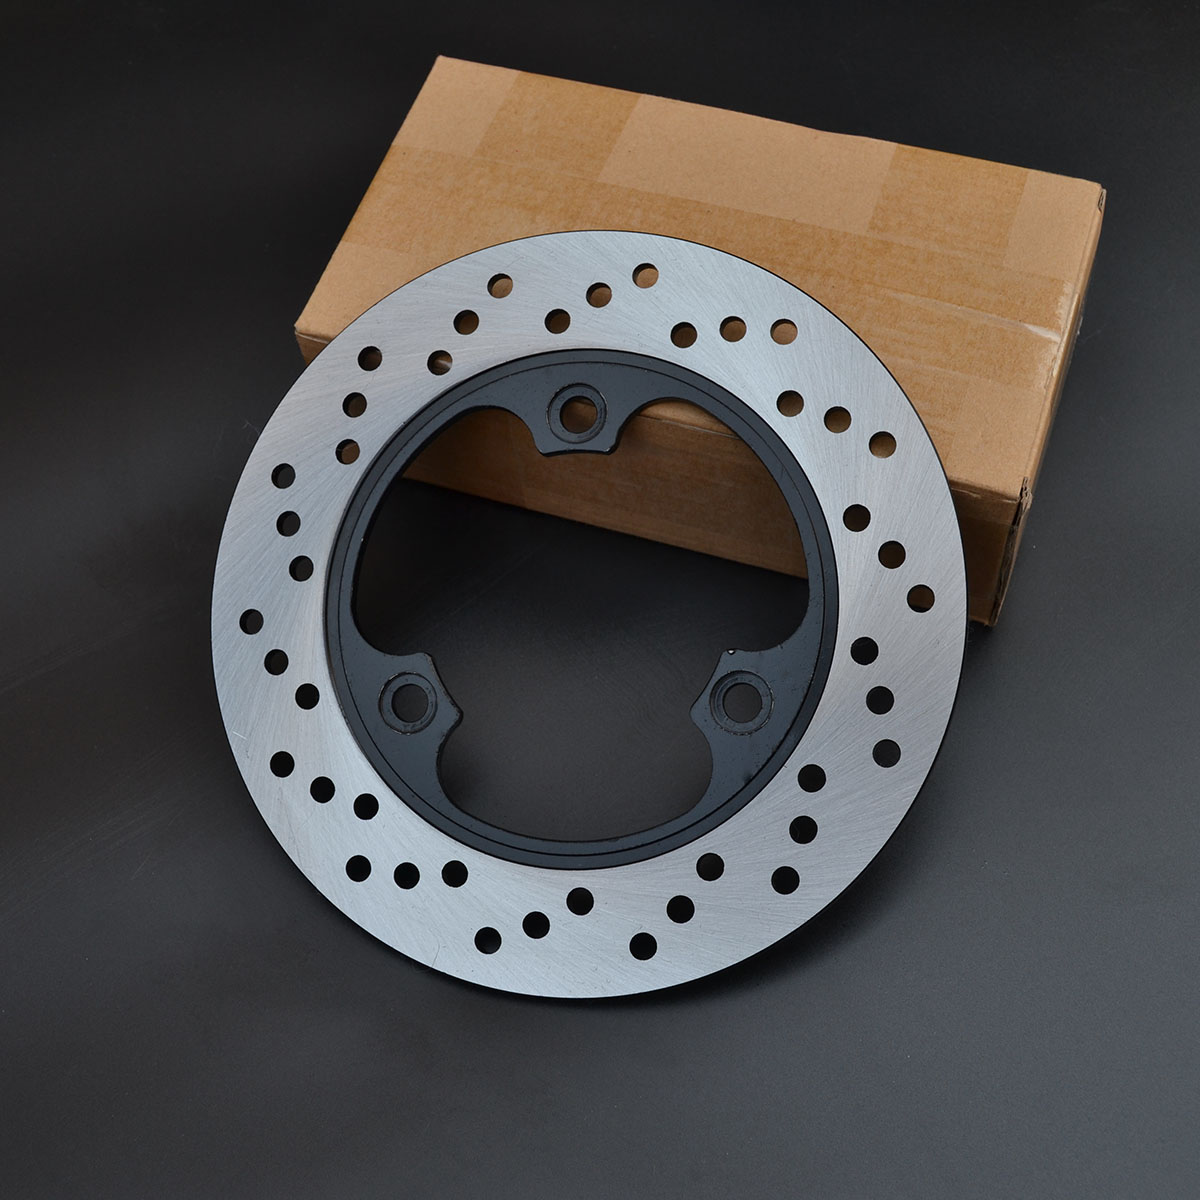 For Honda NS400 NSR400 1985-1987 VFR400R 86 VFR400 86-87 Rear Brake Disc Rotor